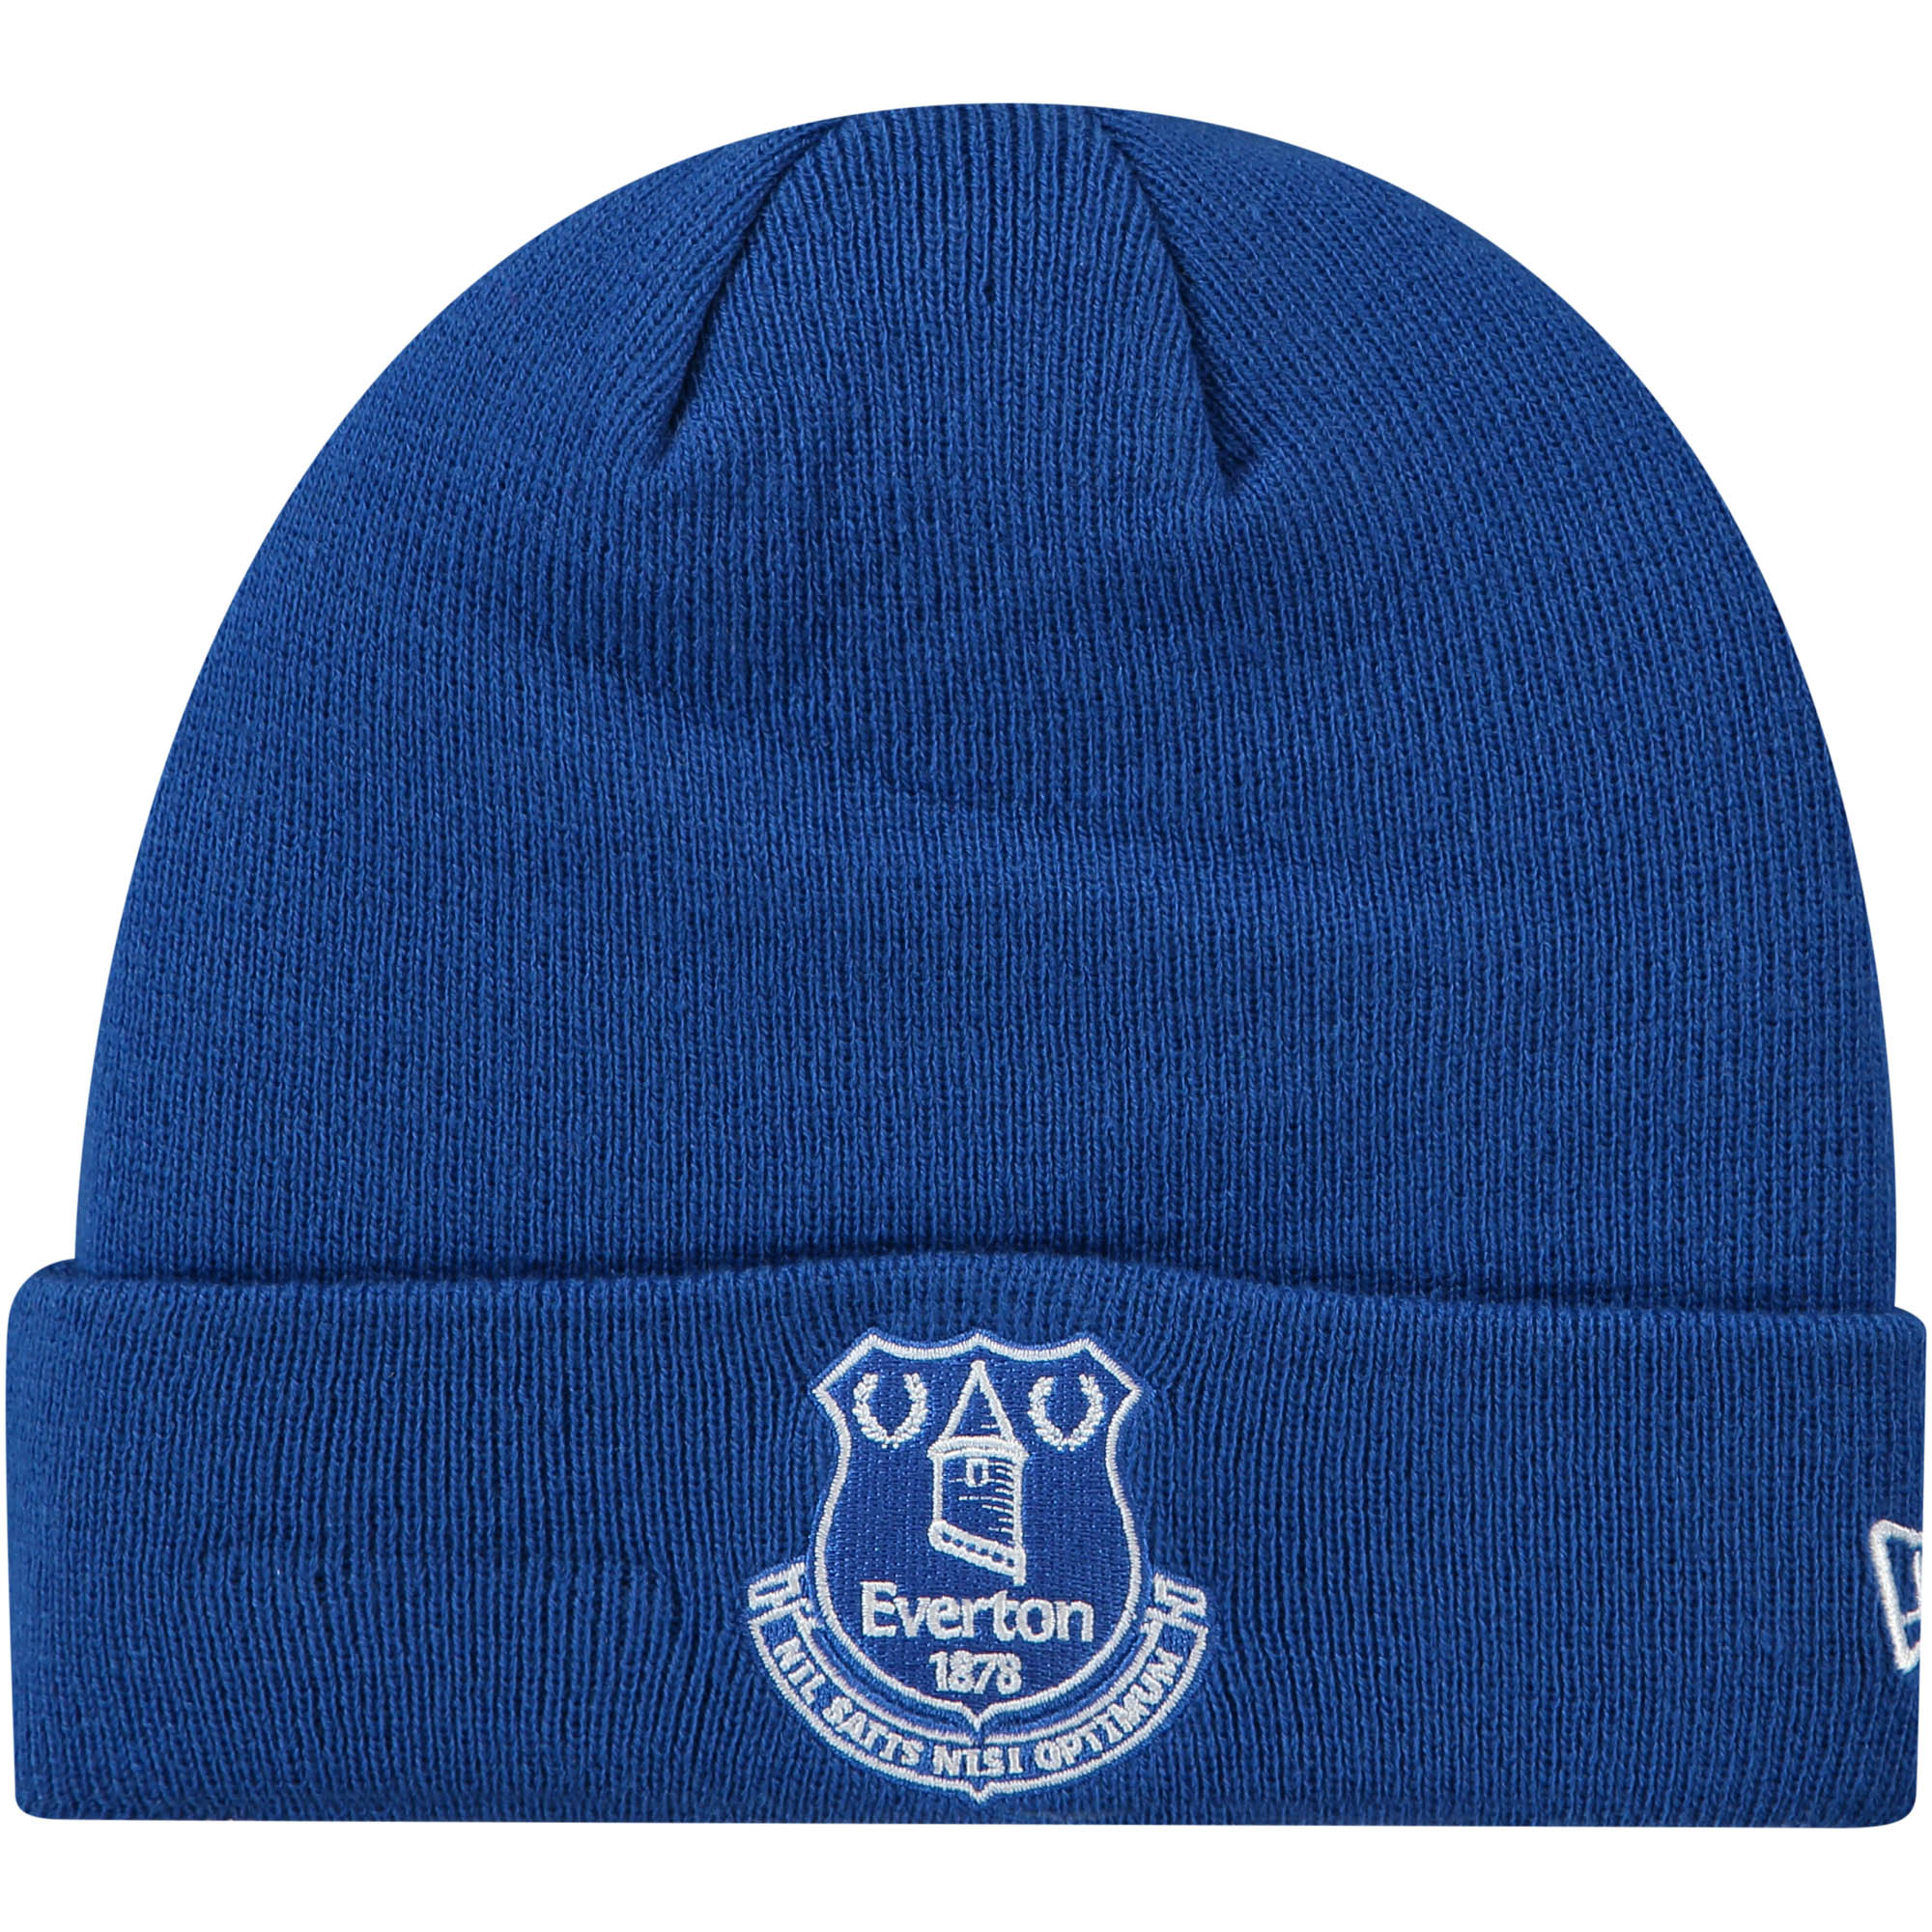 Everton New Era Core Cuff Beanie - Royal